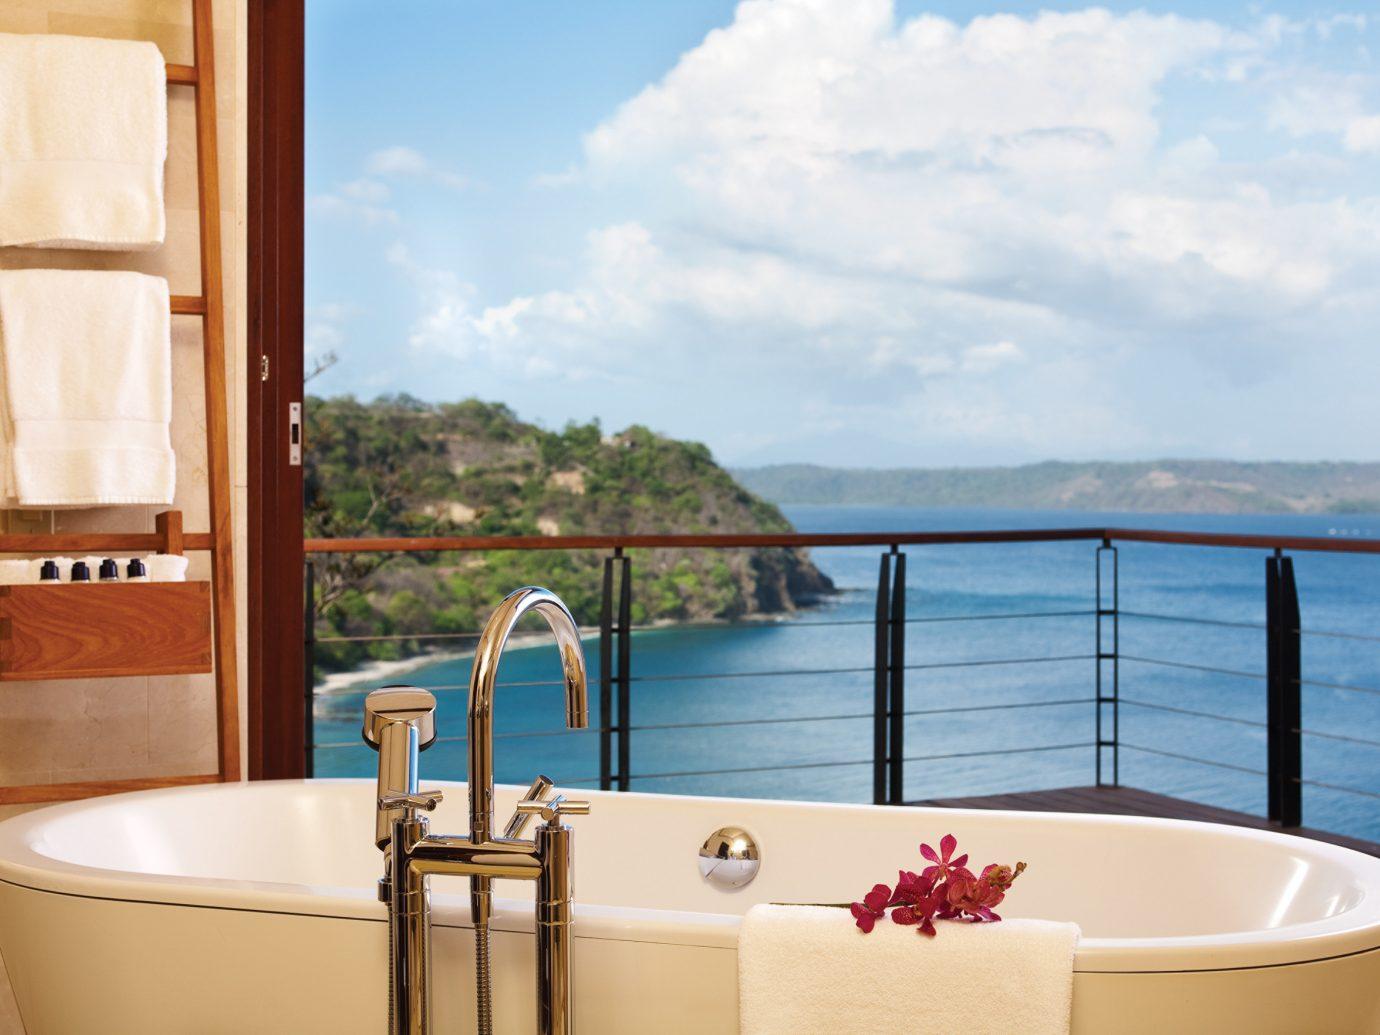 Bathroom At Four Seasons Hotel In Costa Rica